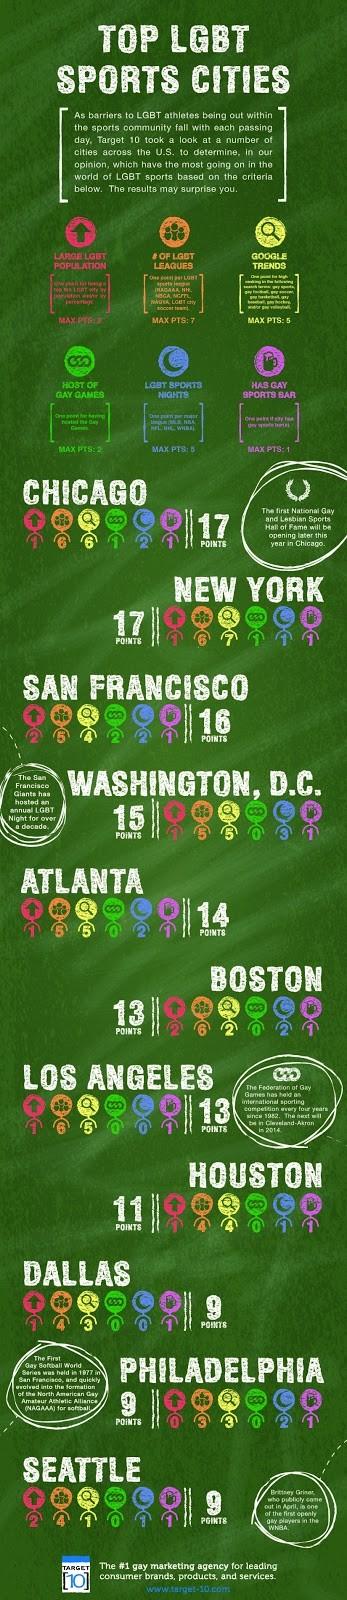 top lgbt sports cities